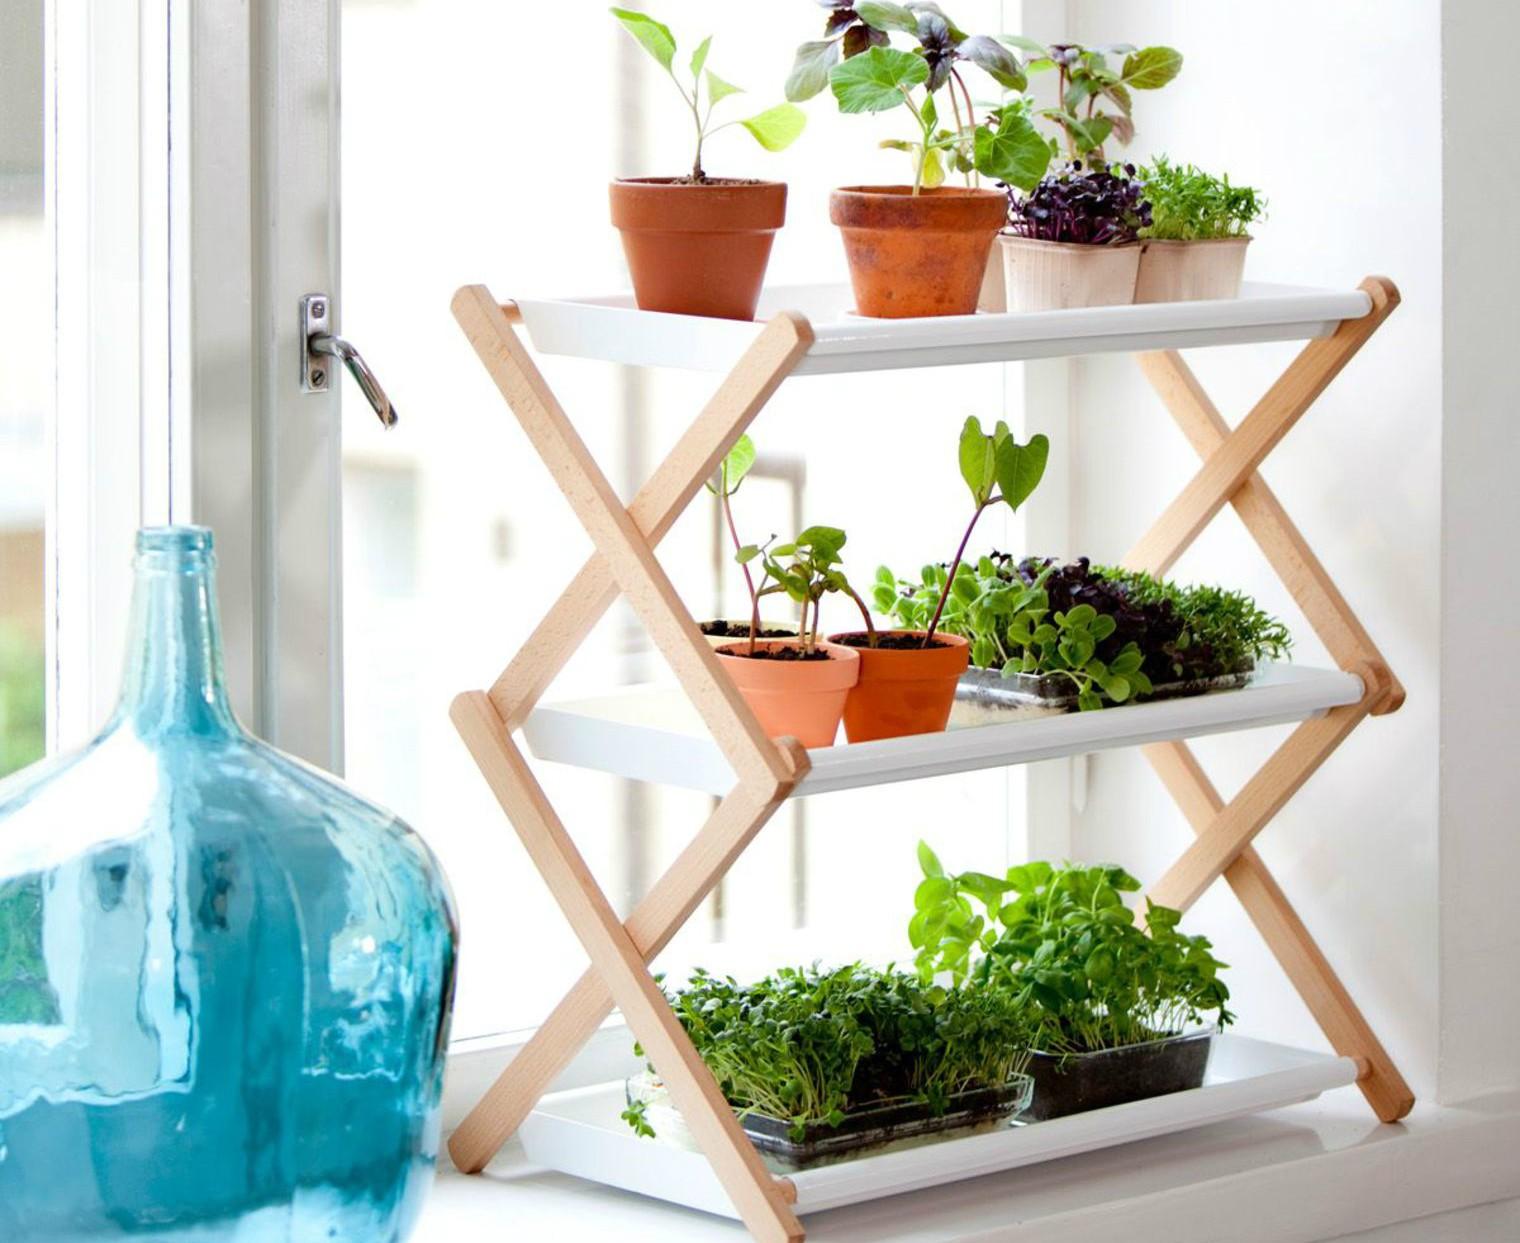 Подставки для цветов на подоконник Условия для выращивания цветов на окне 51